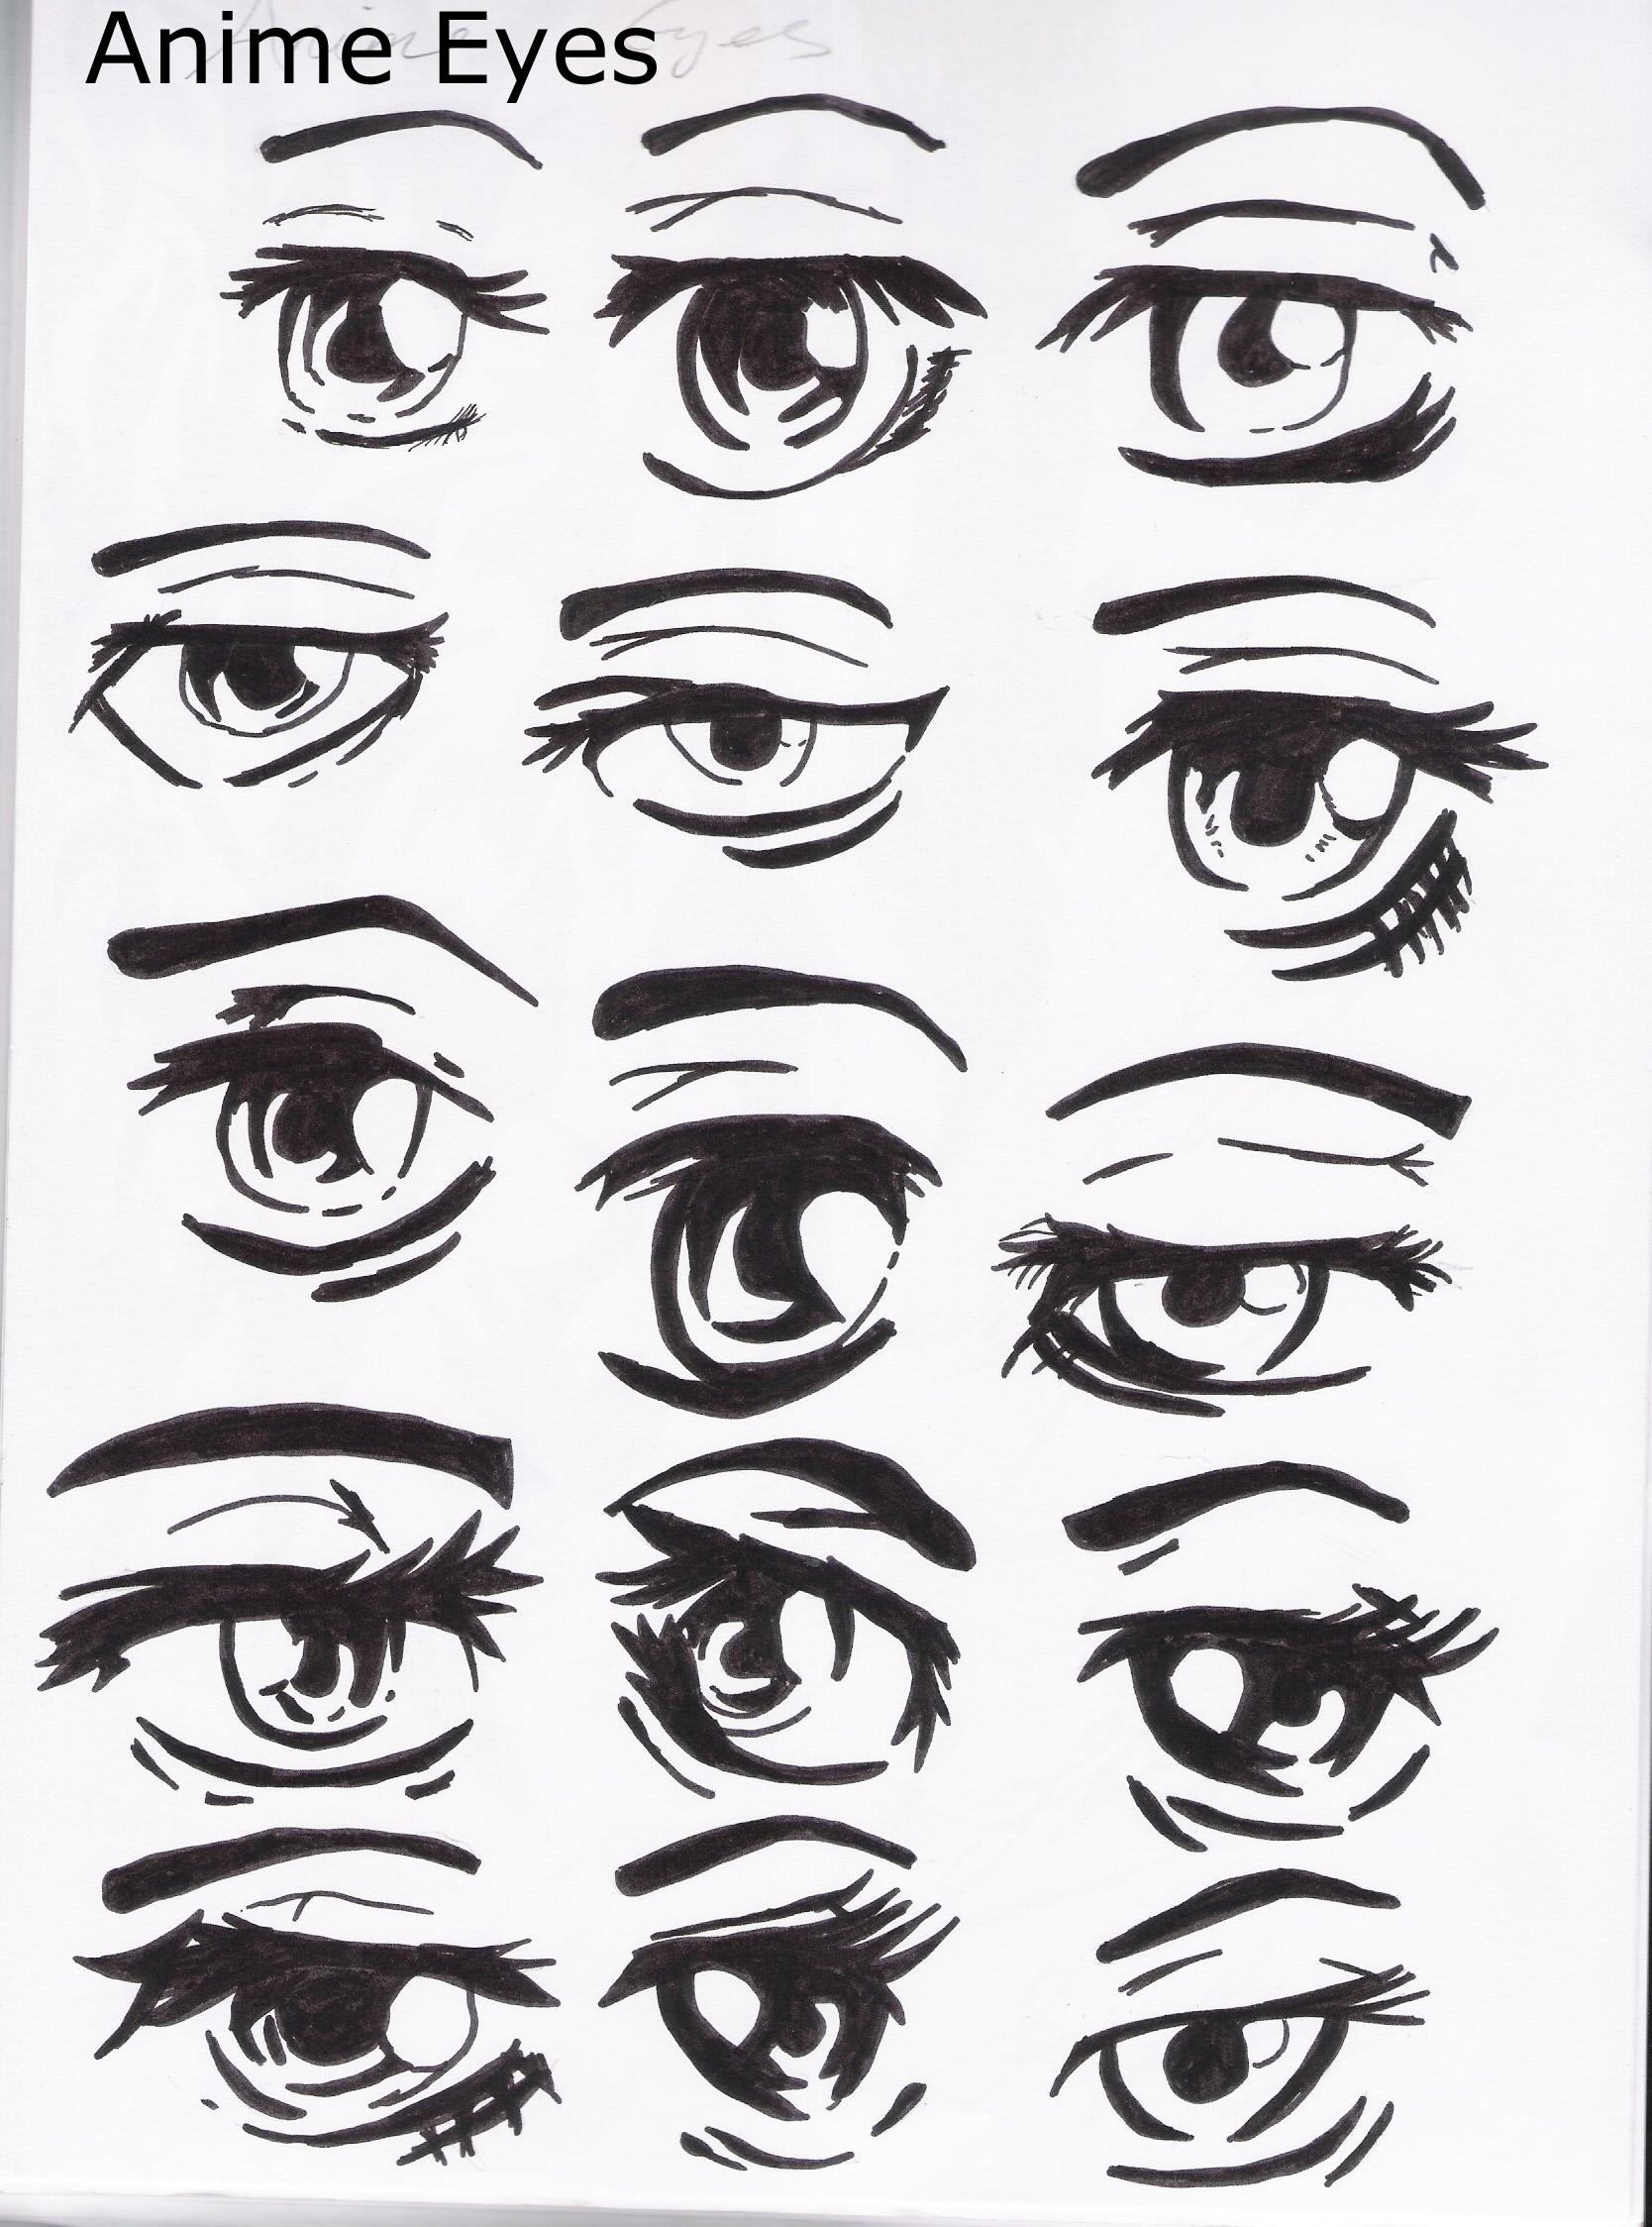 Anime Eyes By Becksbeck